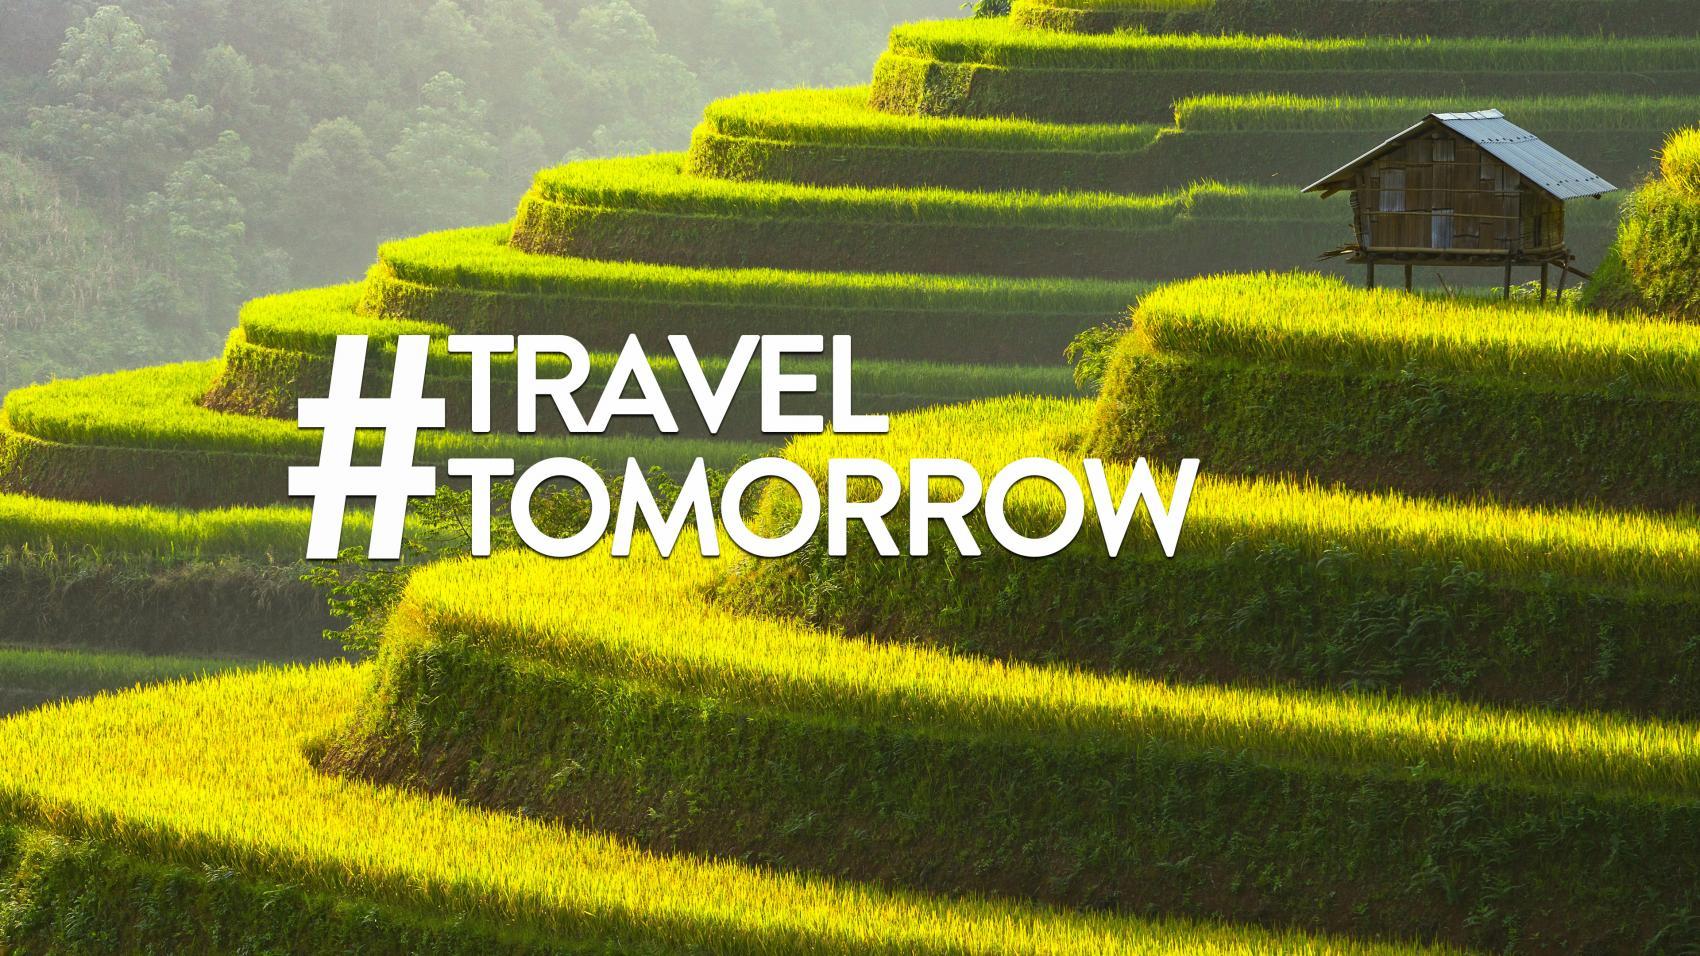 #Travel Tomorrow